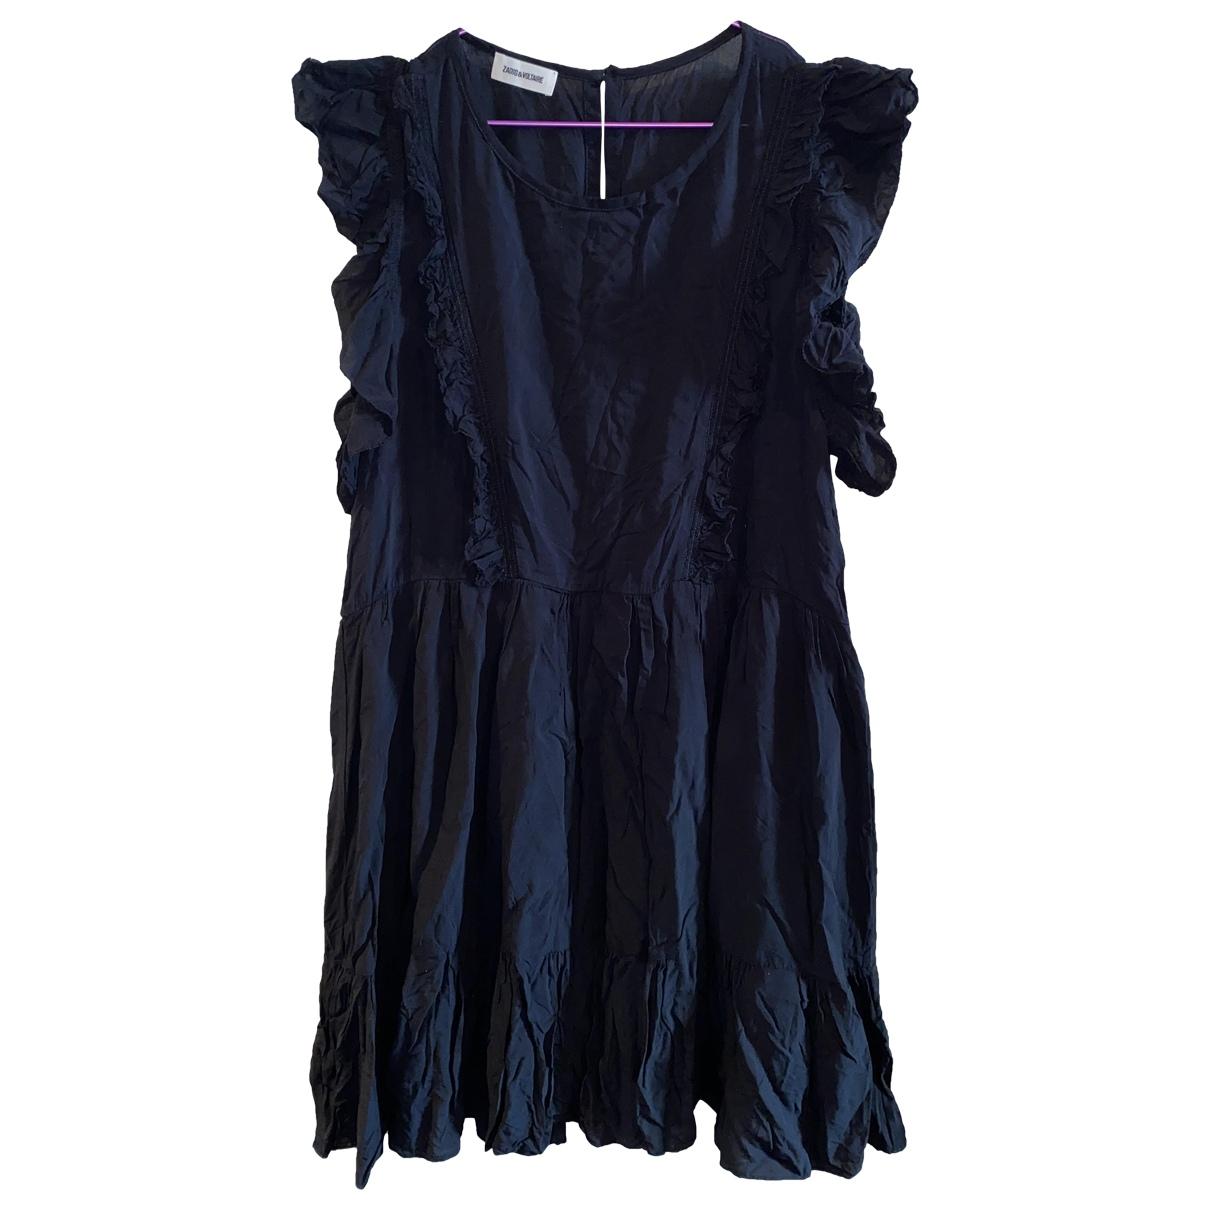 Zadig & Voltaire \N Kleid in  Schwarz Viskose